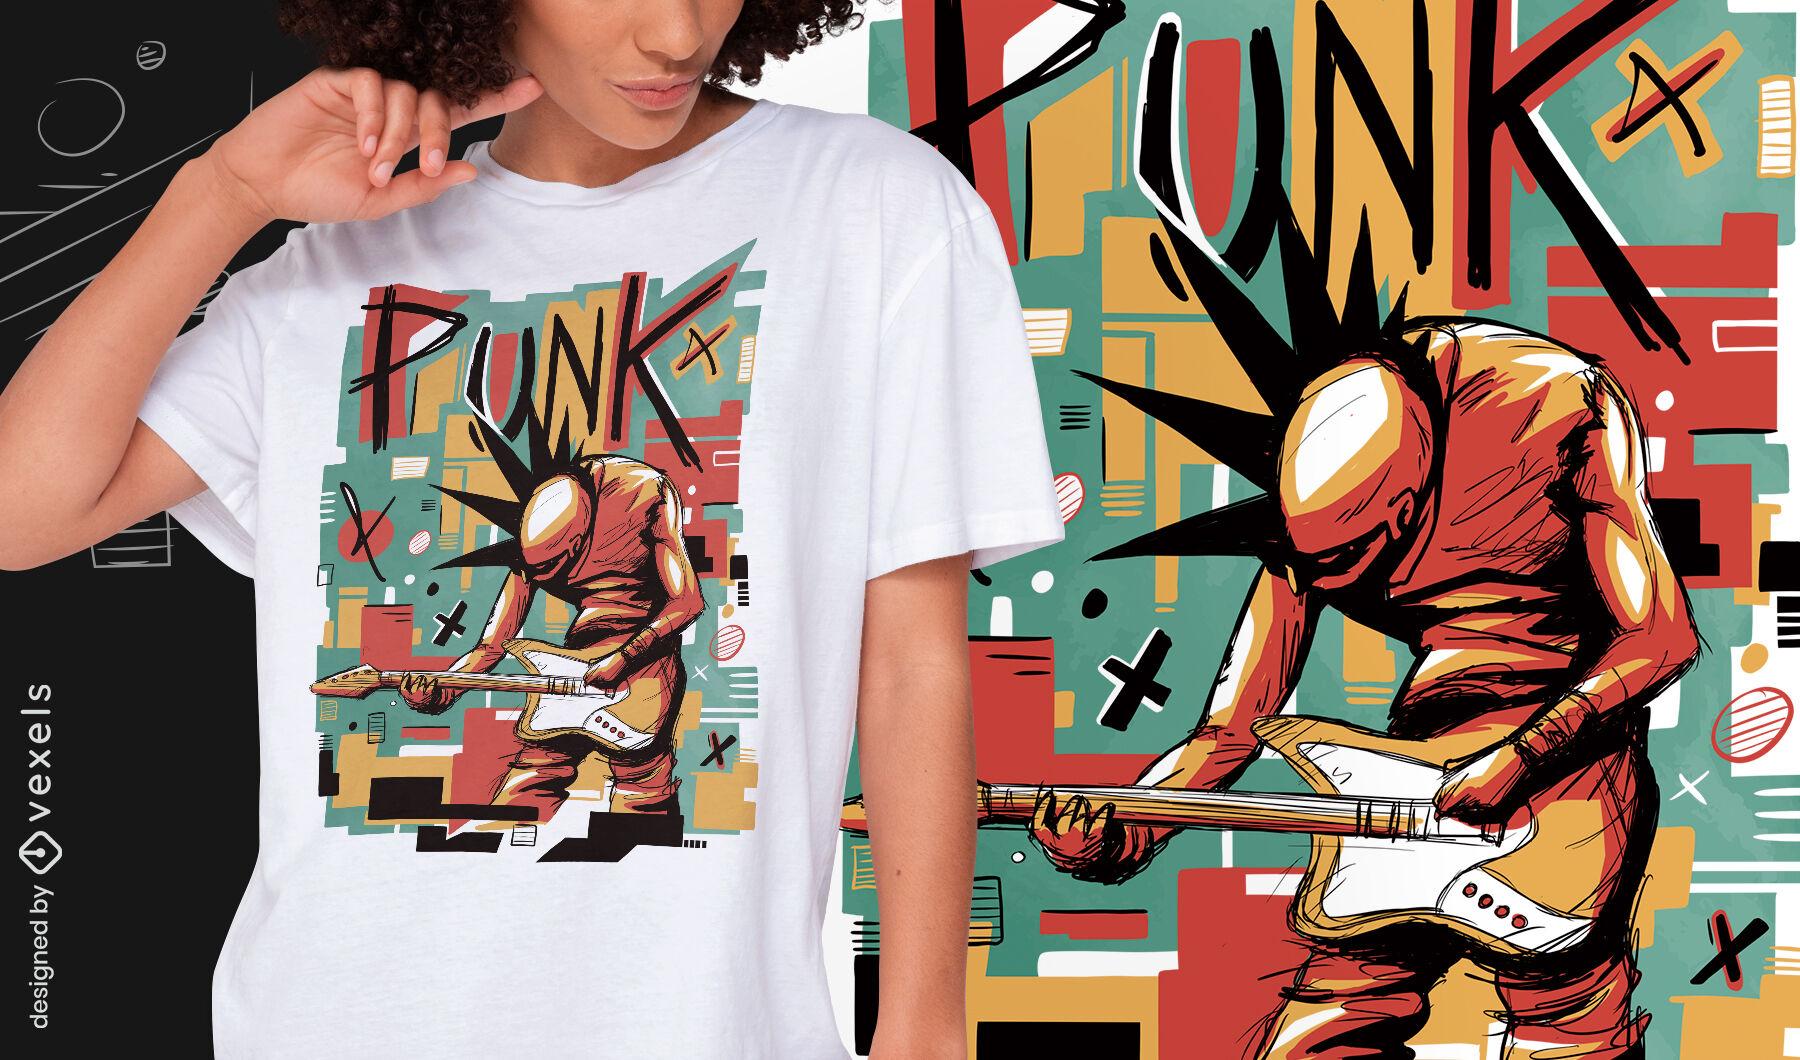 Punkmusiker abstraktes PSD-T-Shirt